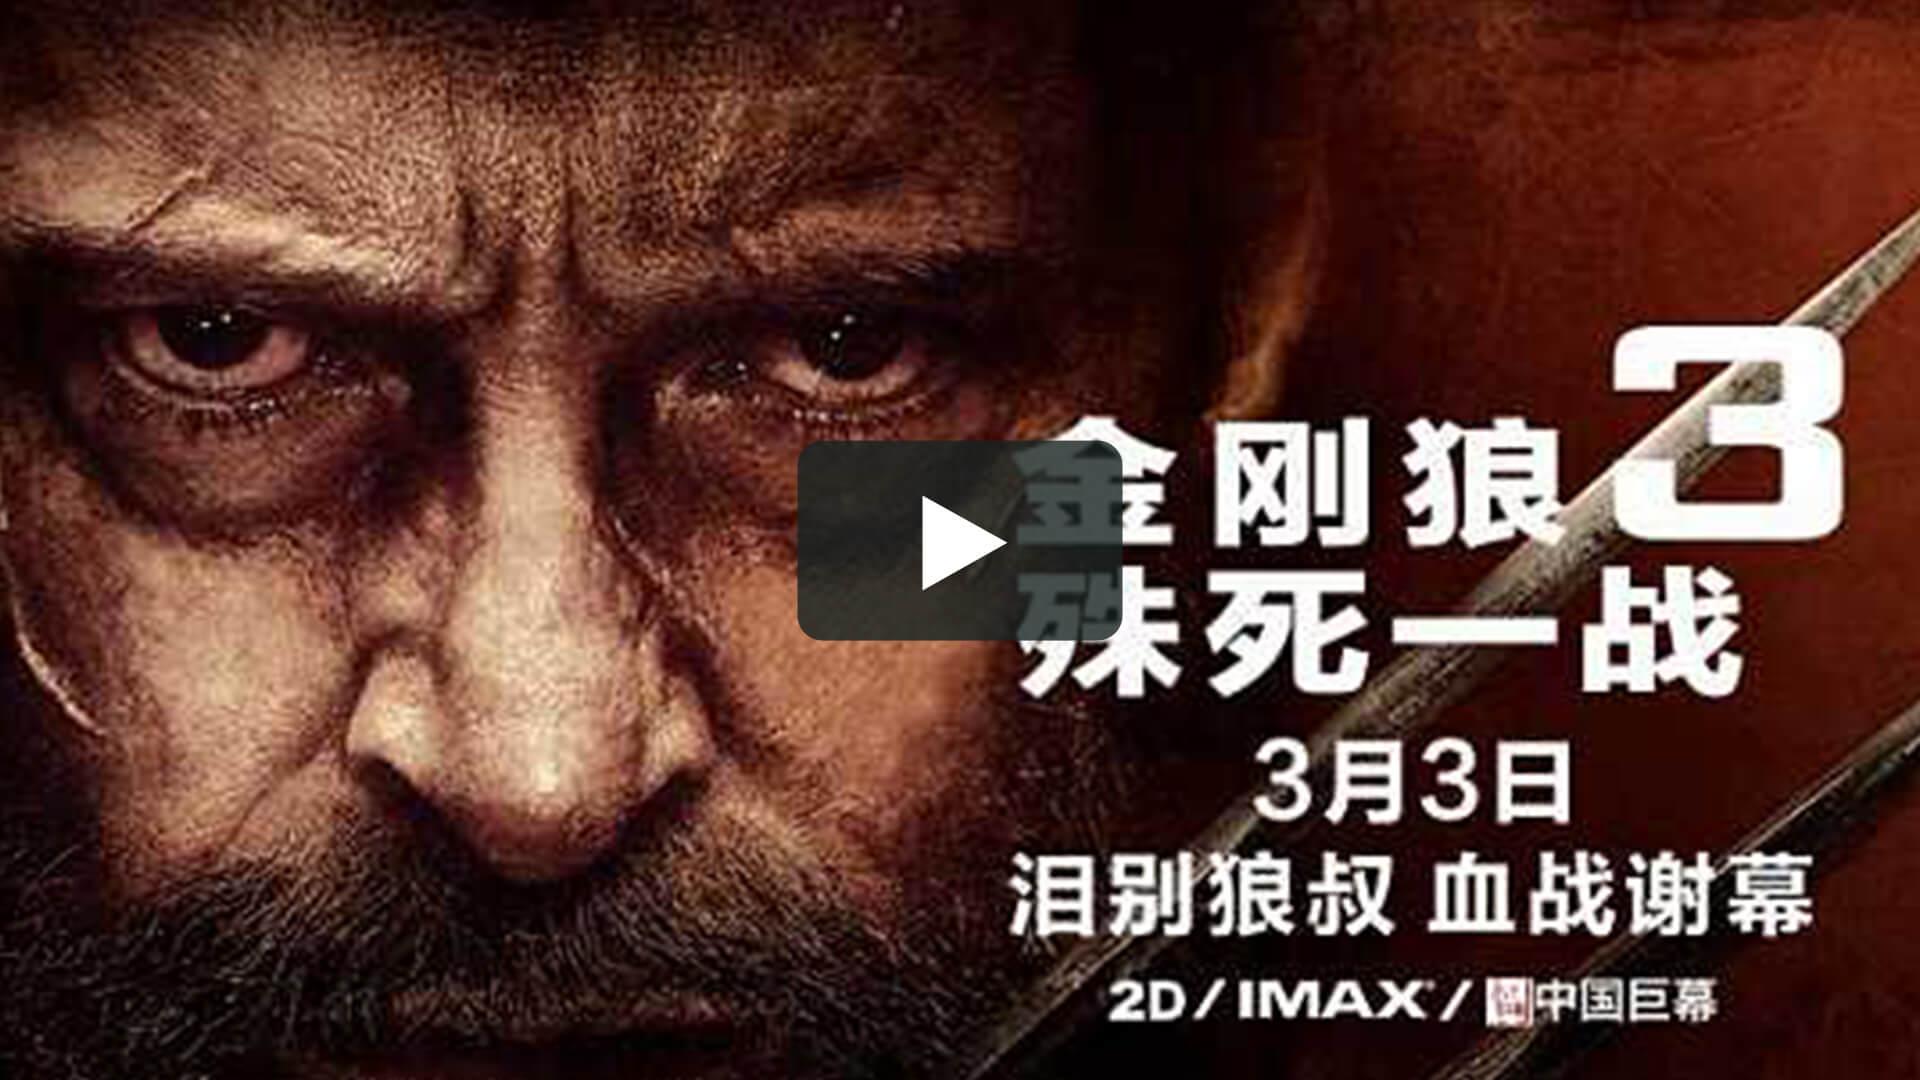 Wolverine 3 - 金剛狼3